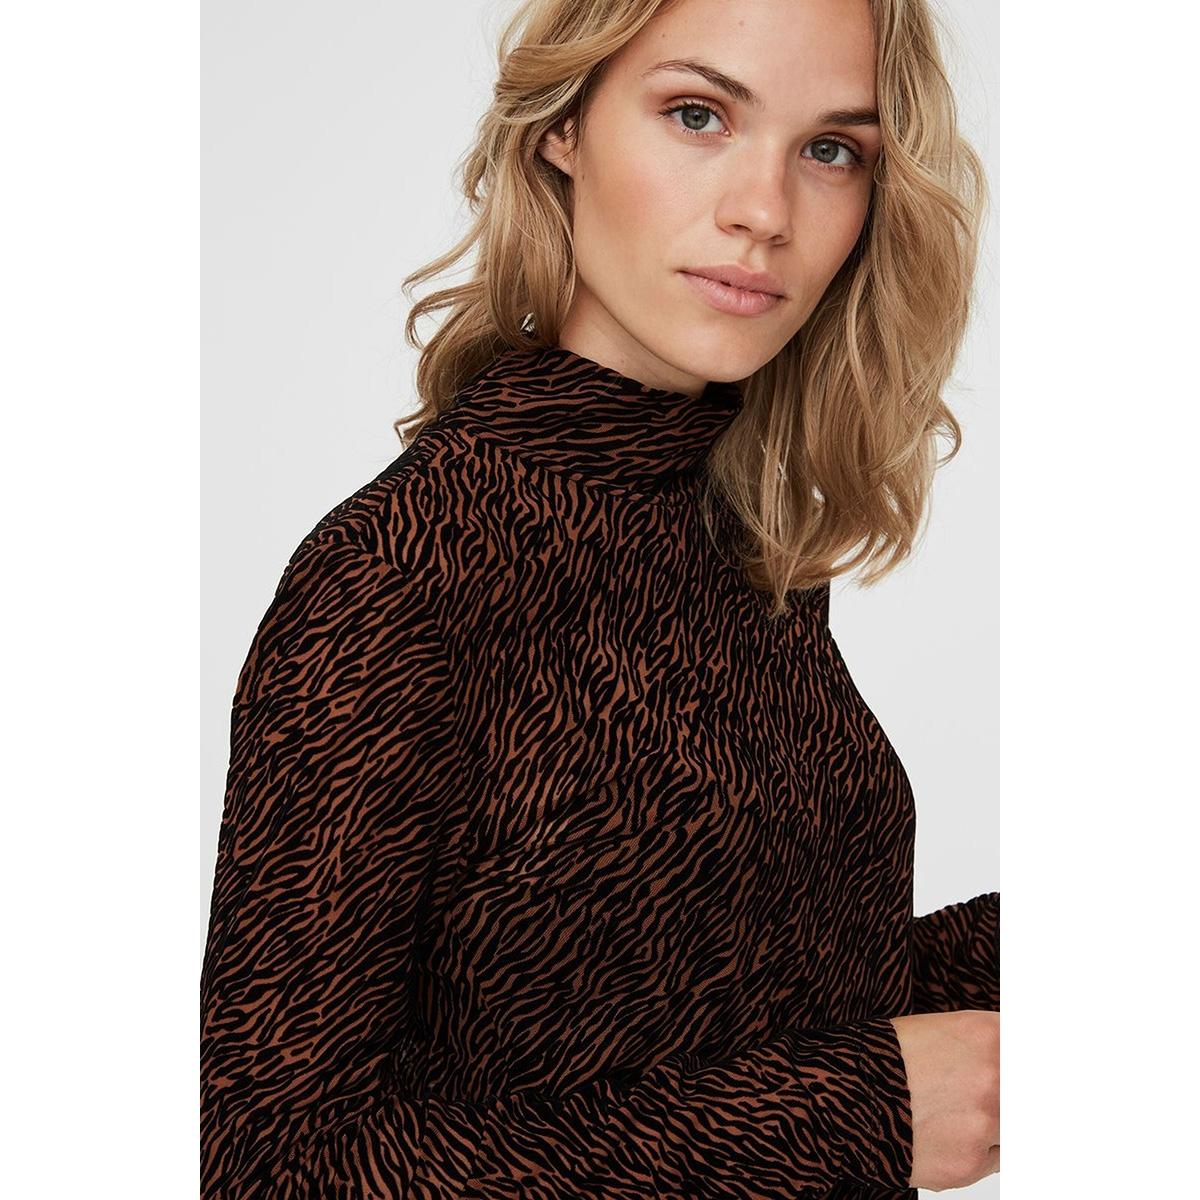 vmfifi ls high neck top jrs  ki 10222821 vero moda t-shirt tortoise shell/fifi aop